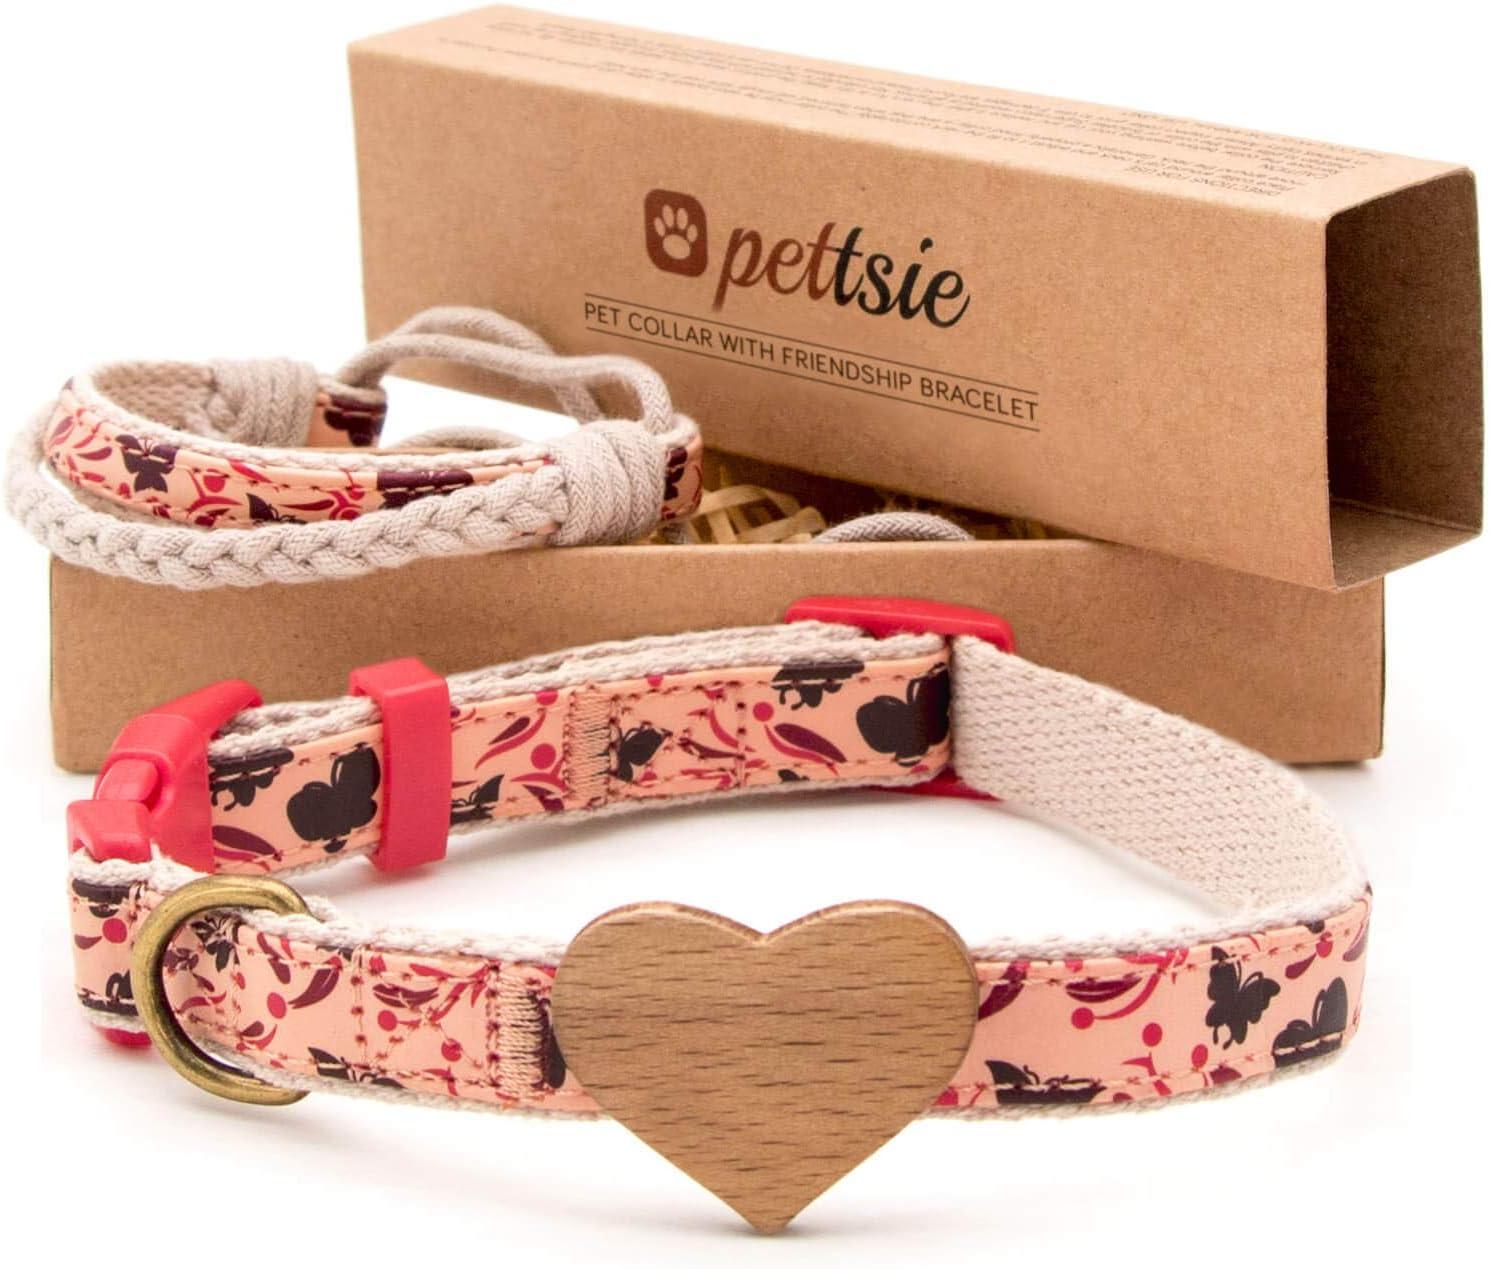 Matching Dog Collar Heart Owner Ranking TOP3 Bracelet Adjustabl Friendship Free Shipping New